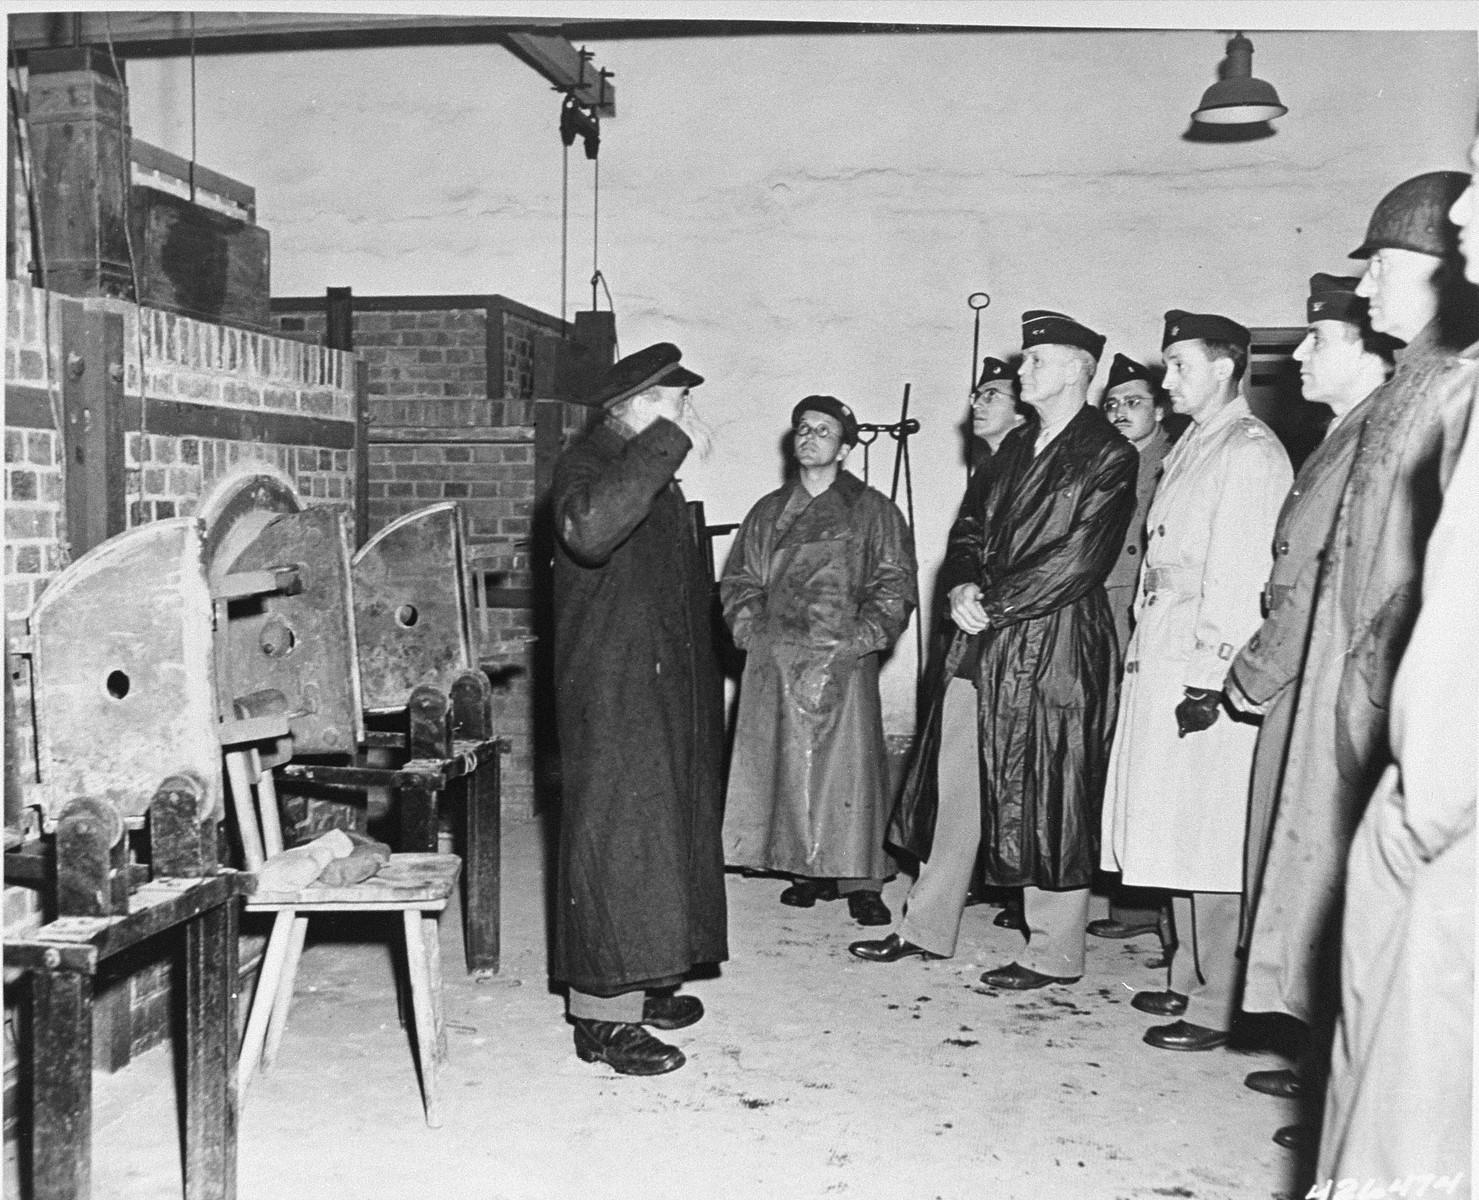 American congressmen view the open ovens in the Buchenwald crematorium.